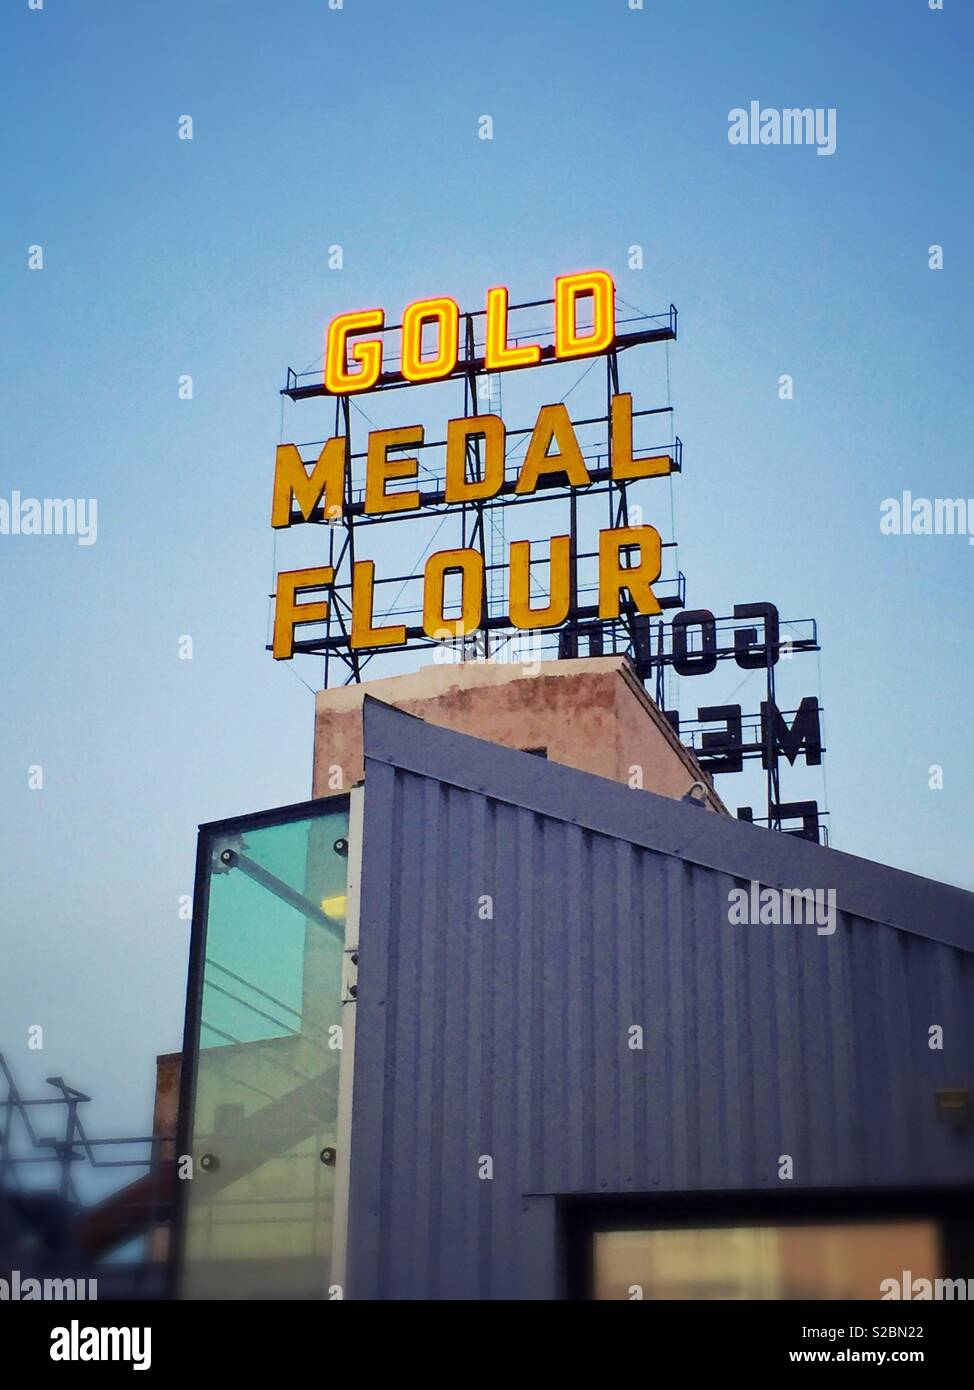 Goldmedaille Mehl Stockfoto